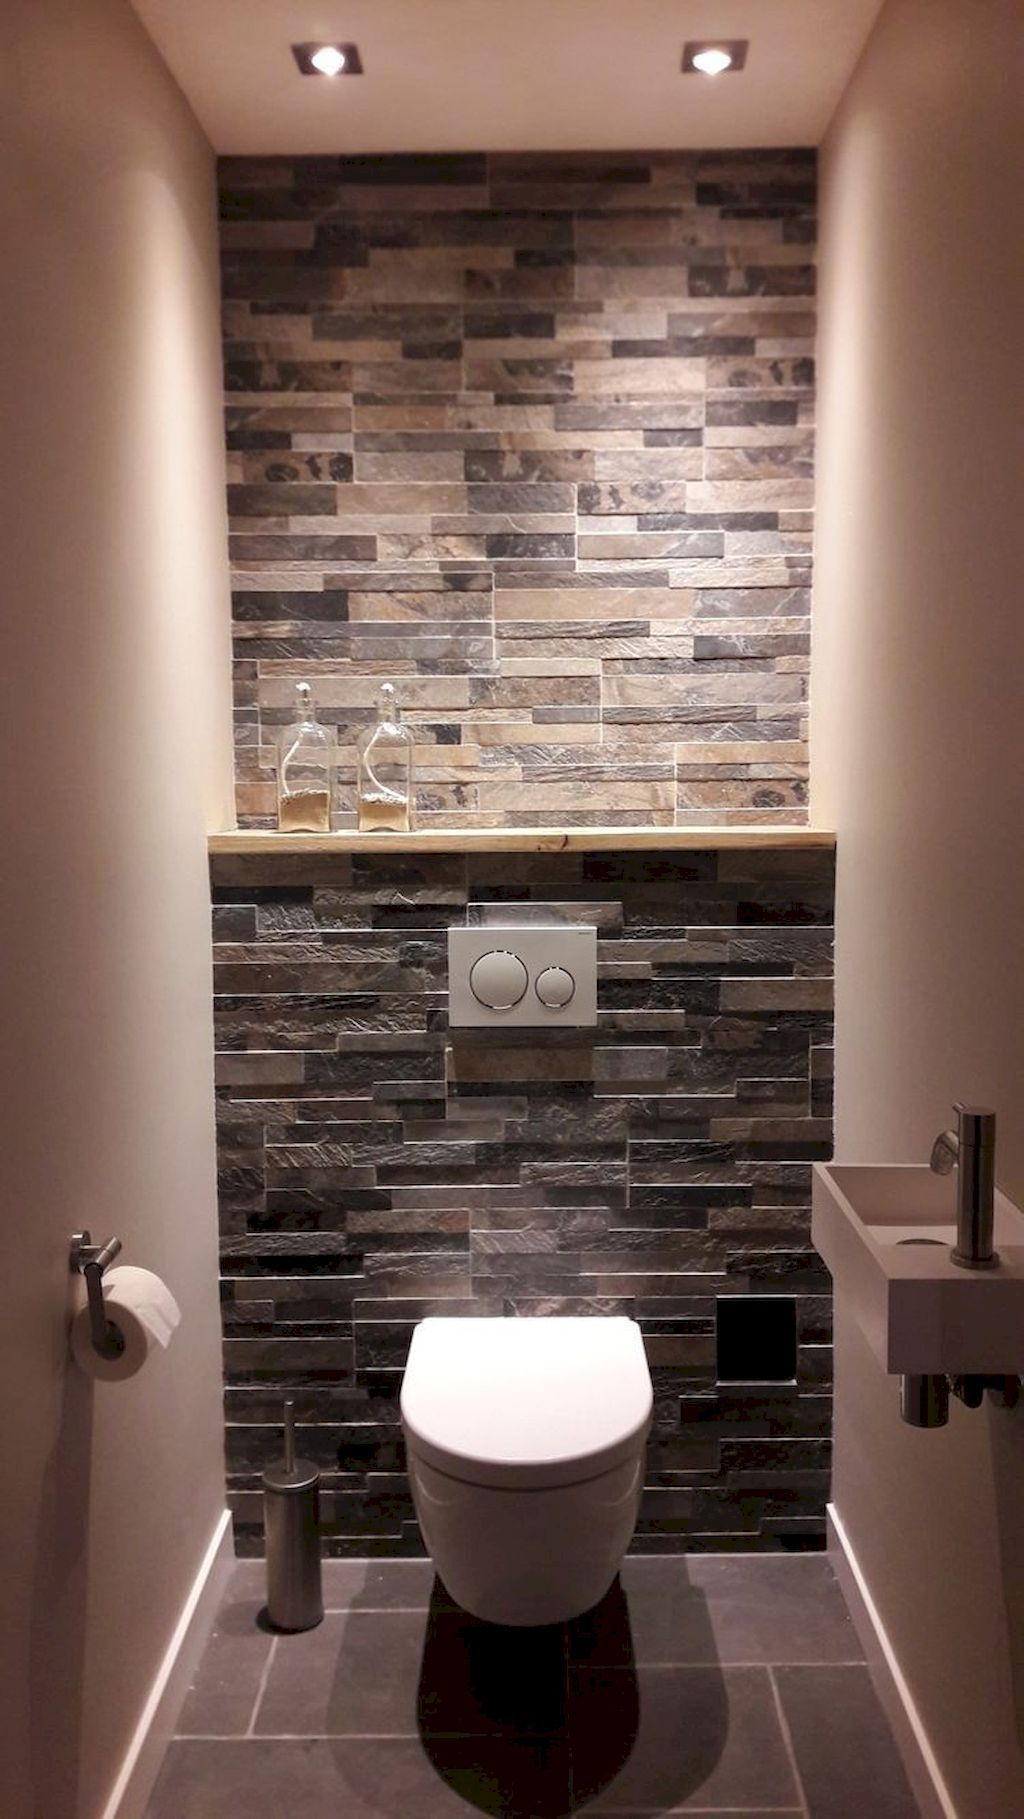 Space Saving Toilet Design For Small Bathroom Space Saving